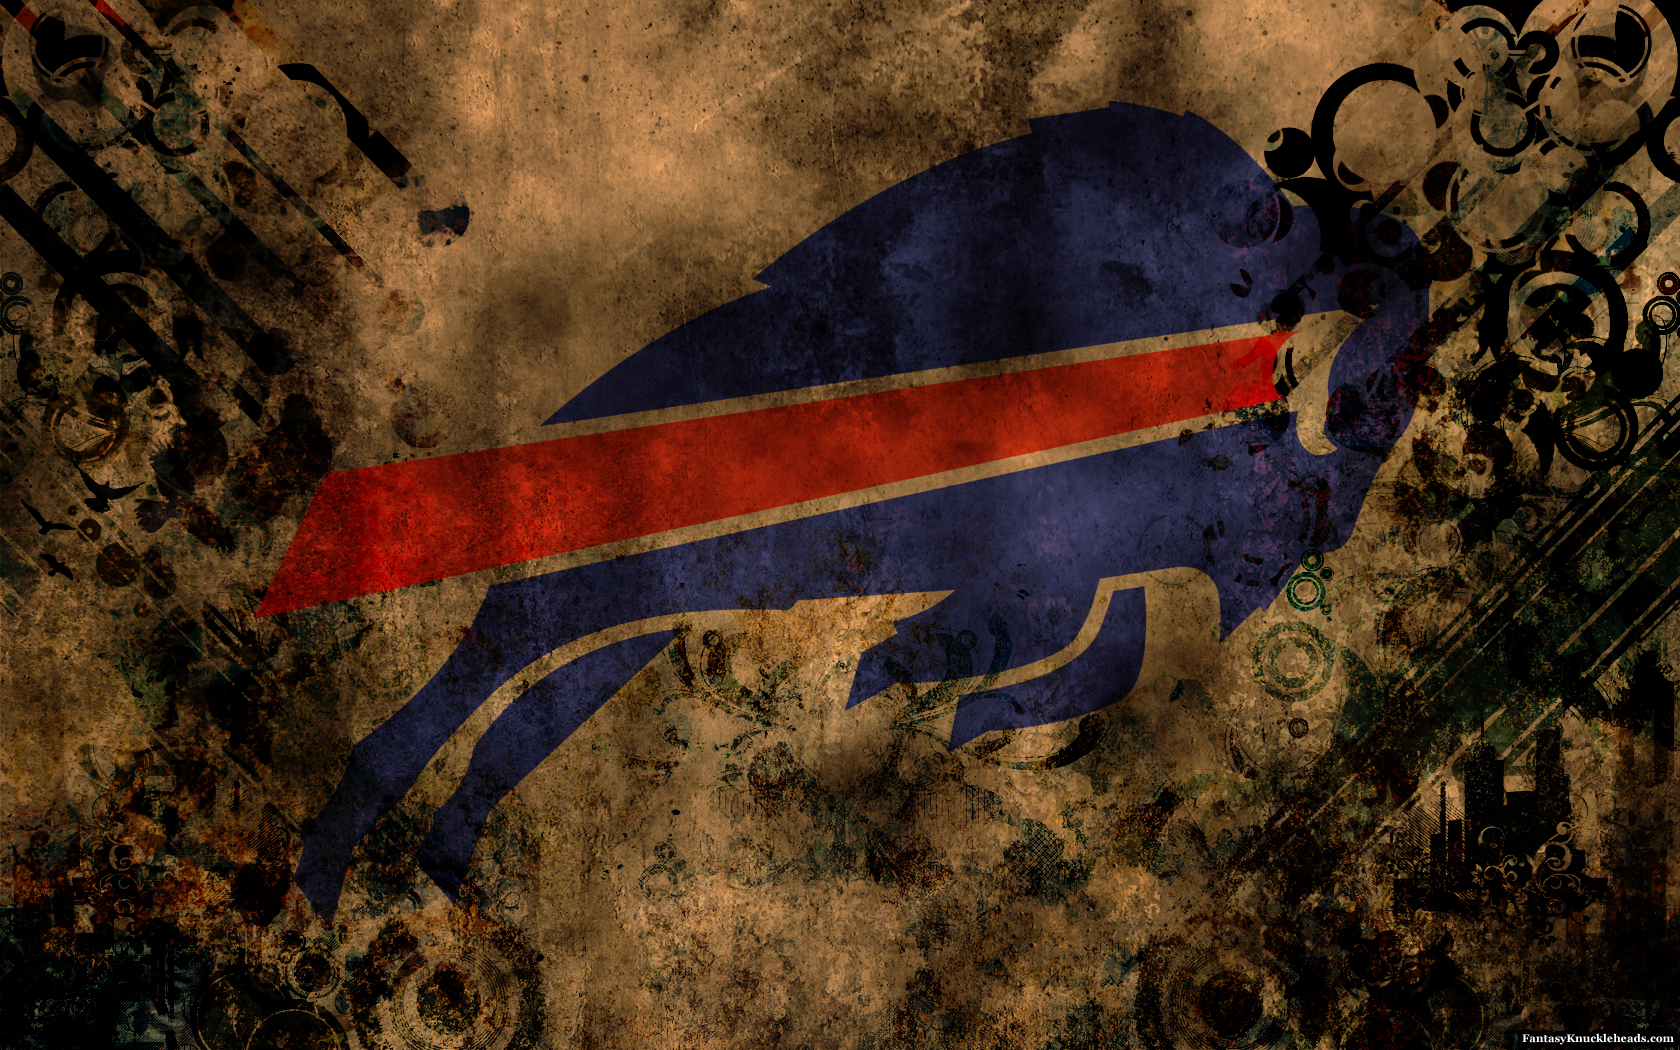 Awesome Buffalo Bills wallpaper wallpaper Buffalo Bills wallpapers 1680x1050